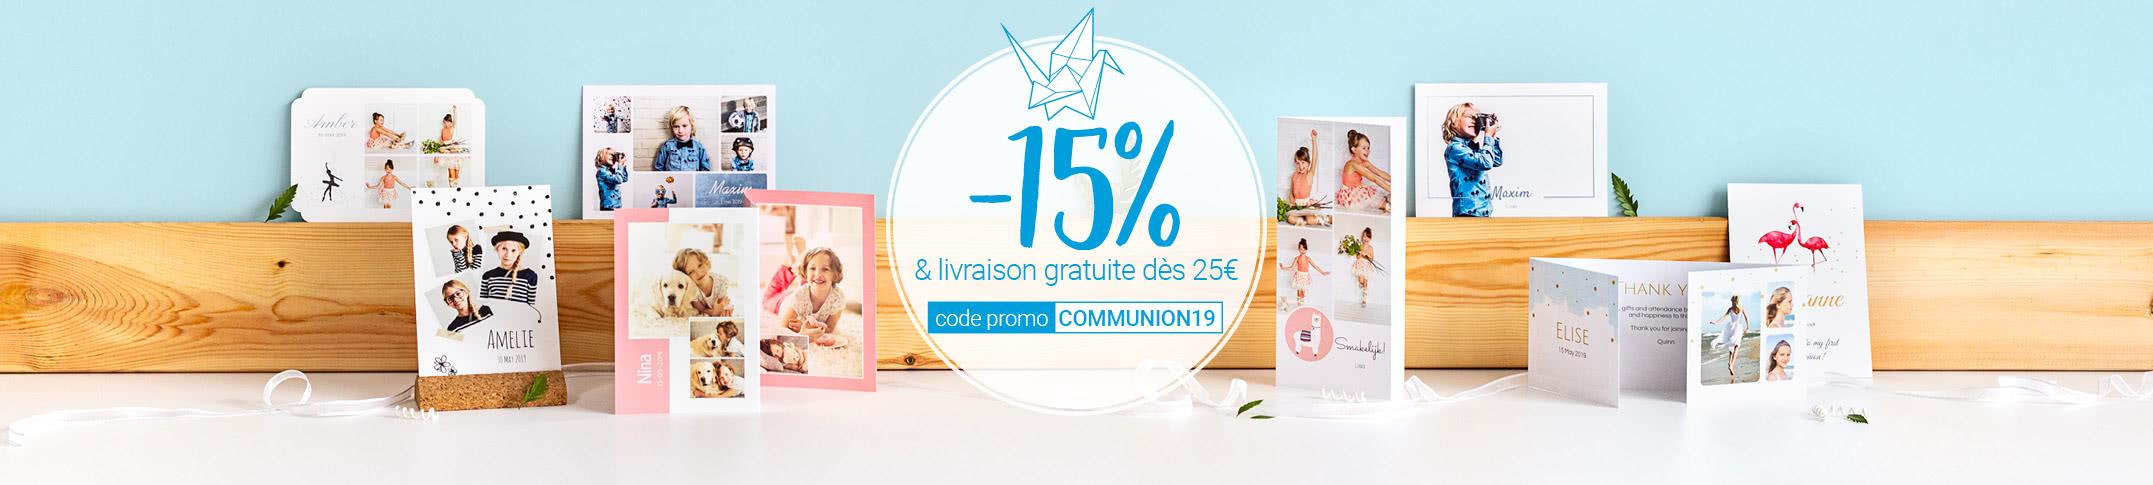 Promotion faire-part communion early bird 2019